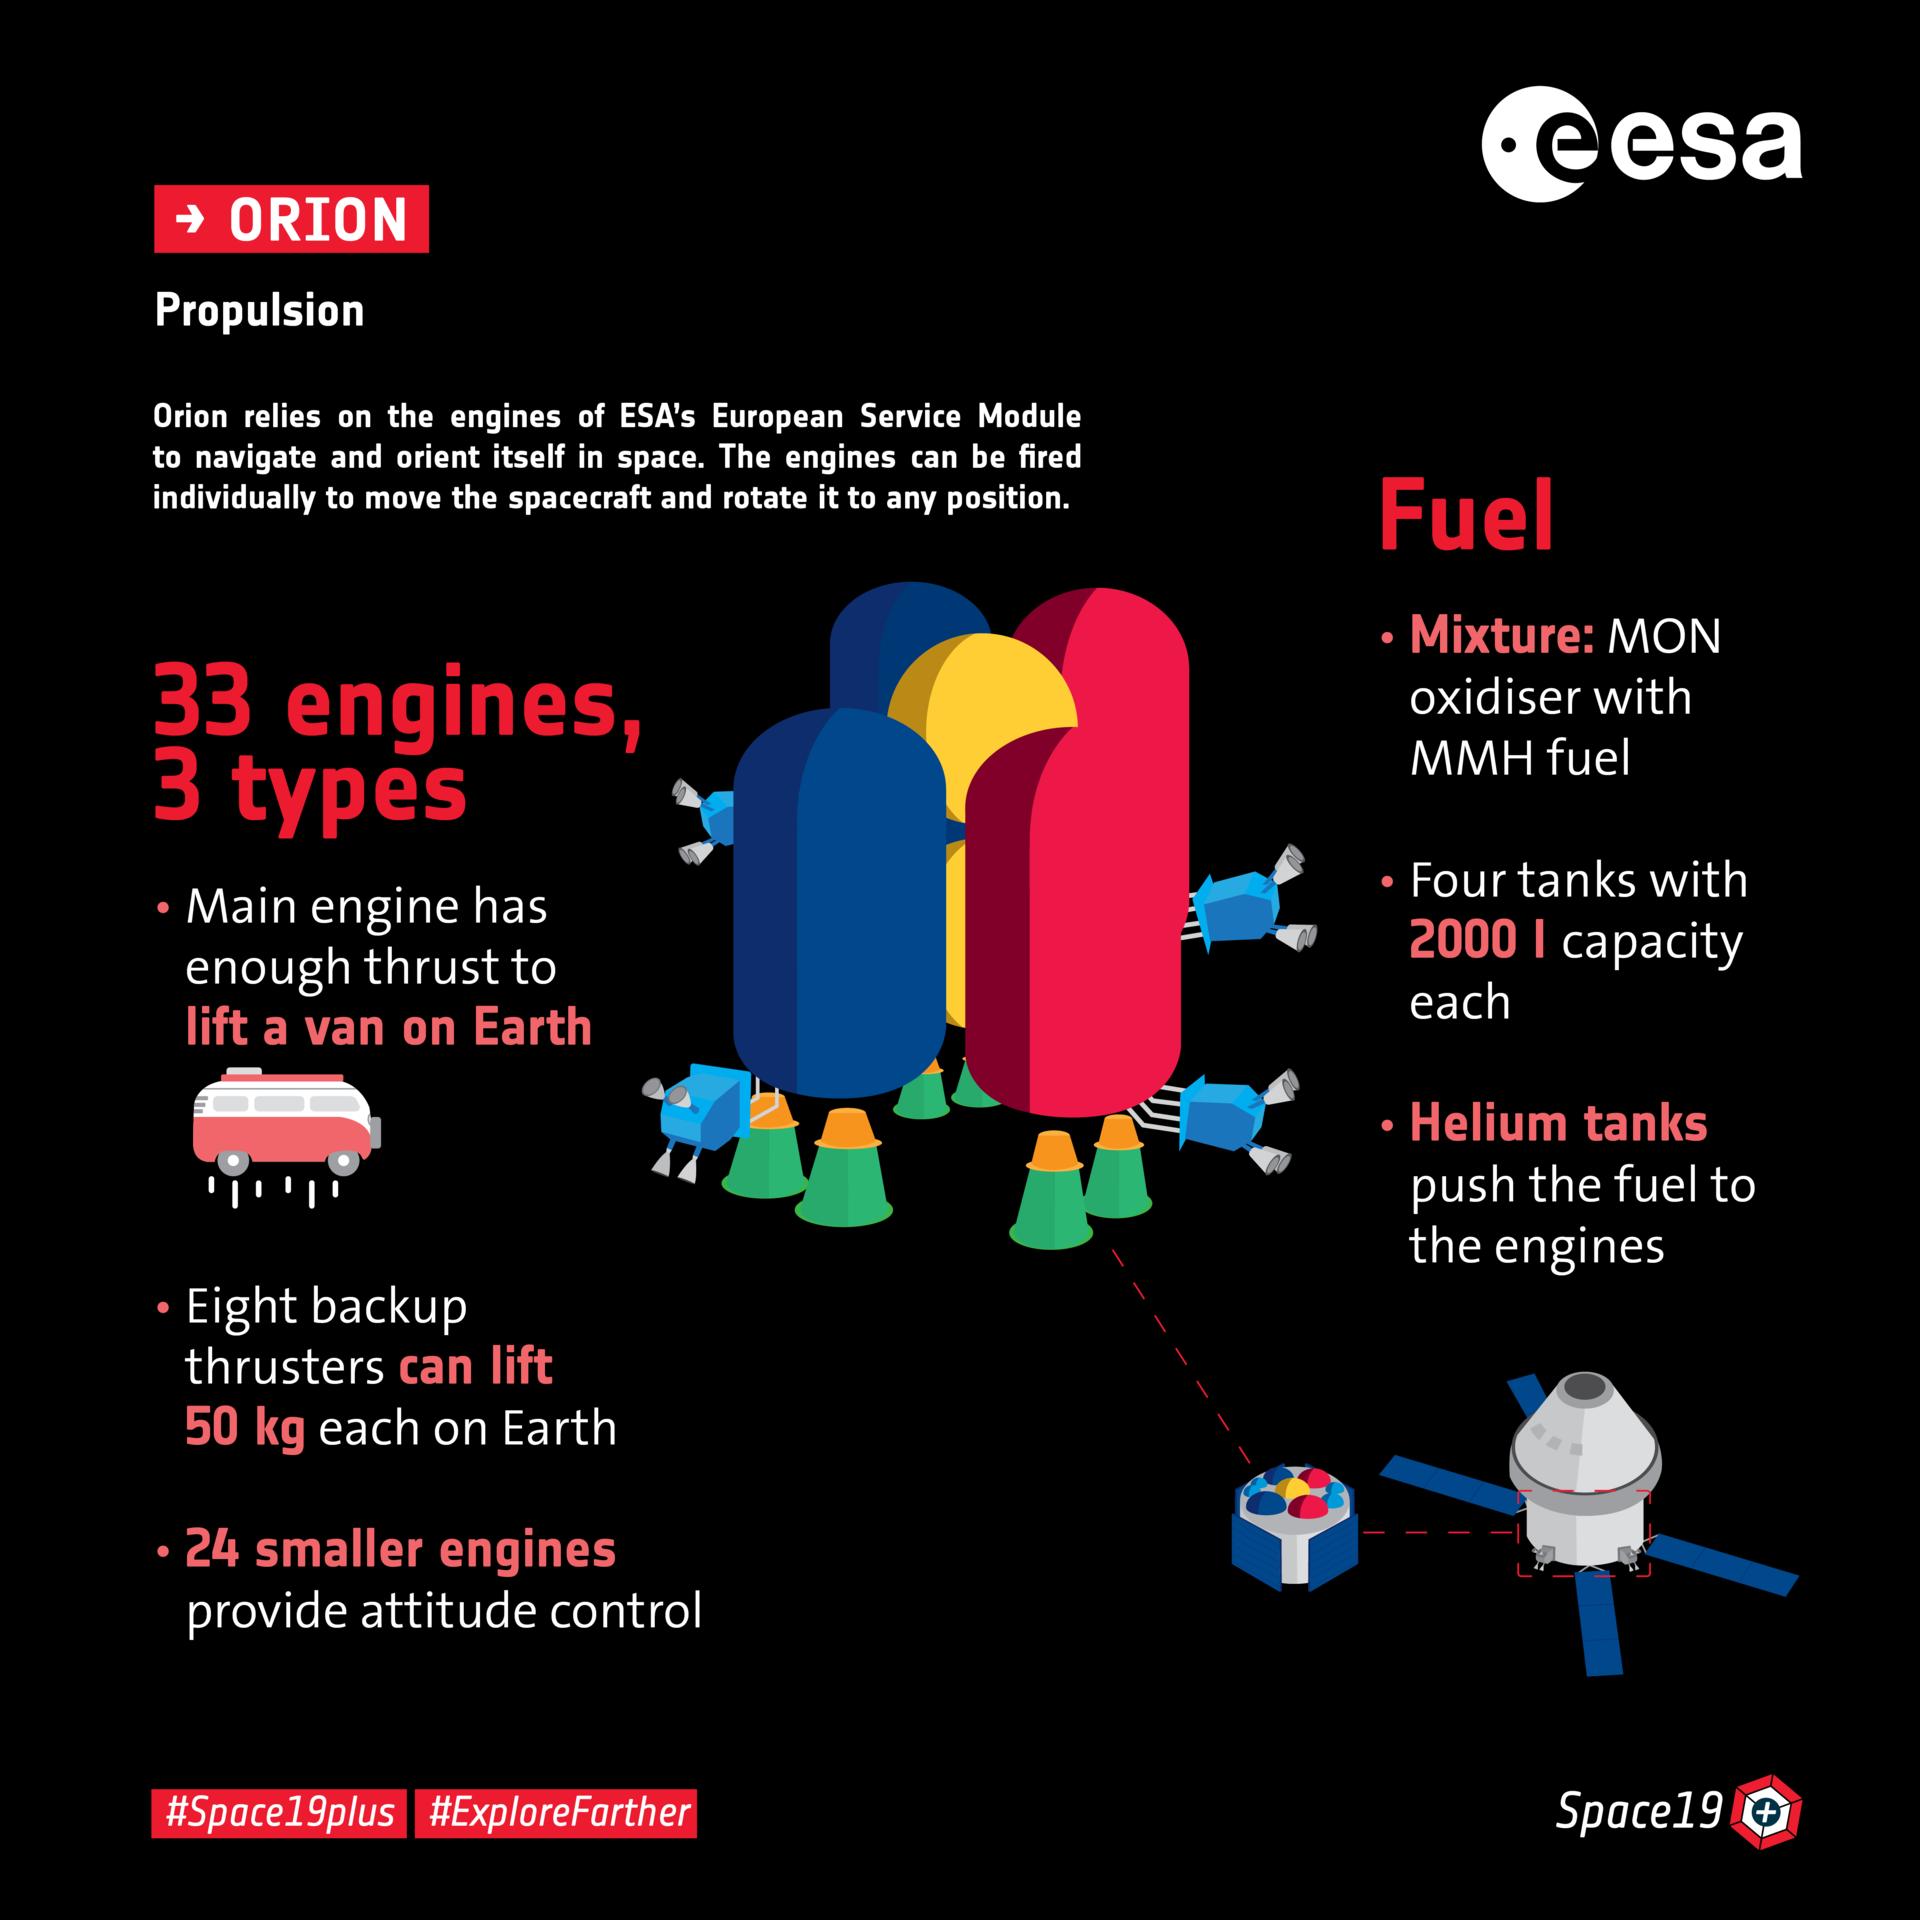 Orion's propulsion